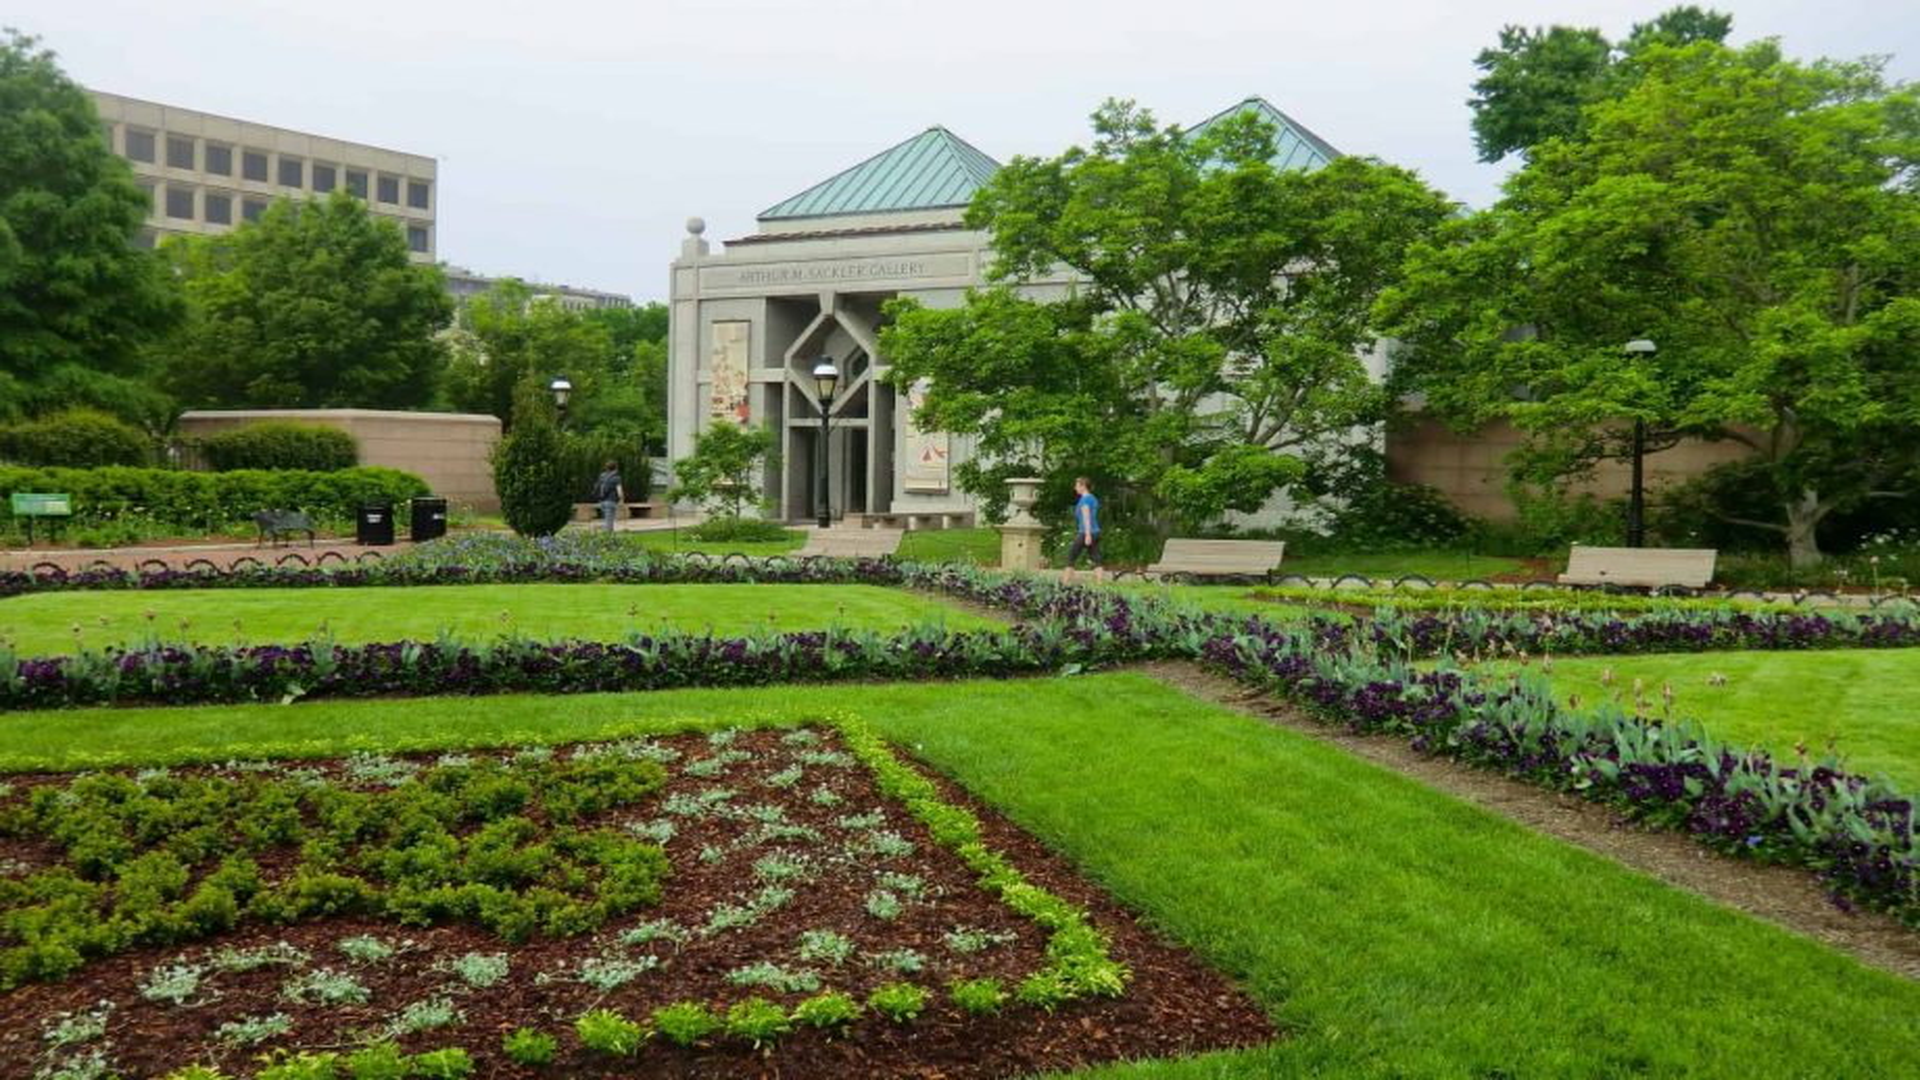 Oregon Senator calls for removal of Sackler name at the Smithsonian